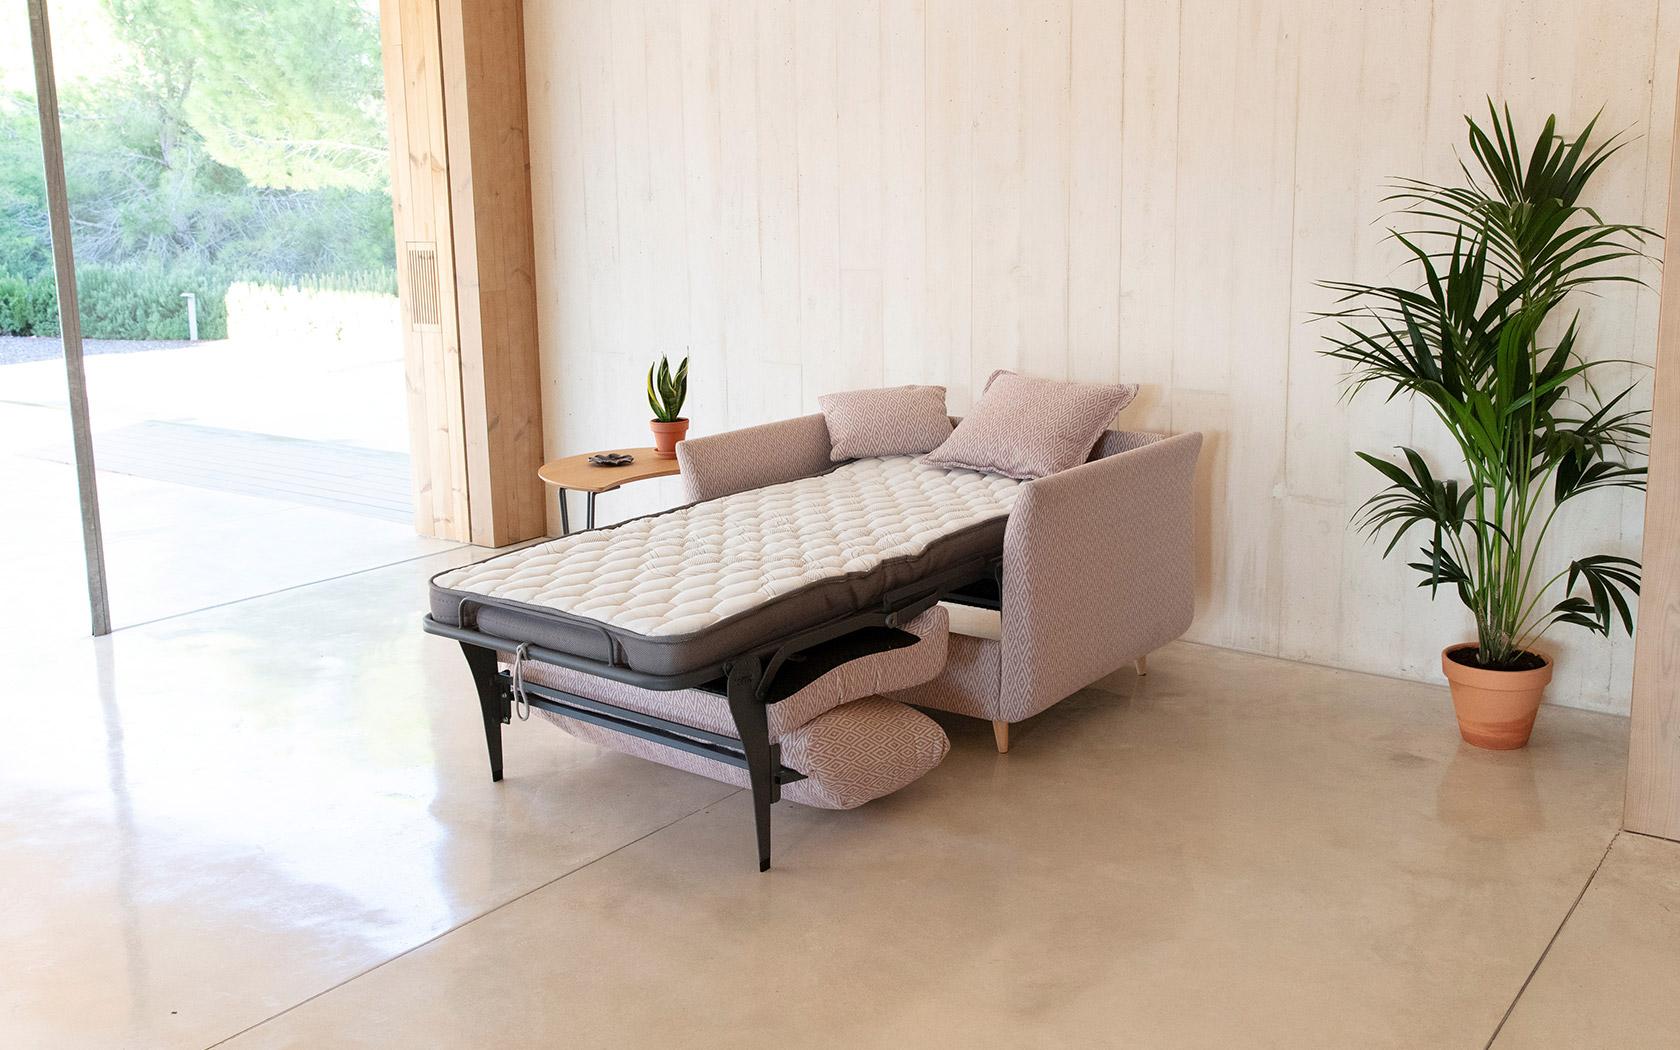 Helsinki sofa cama 2021 baja 05